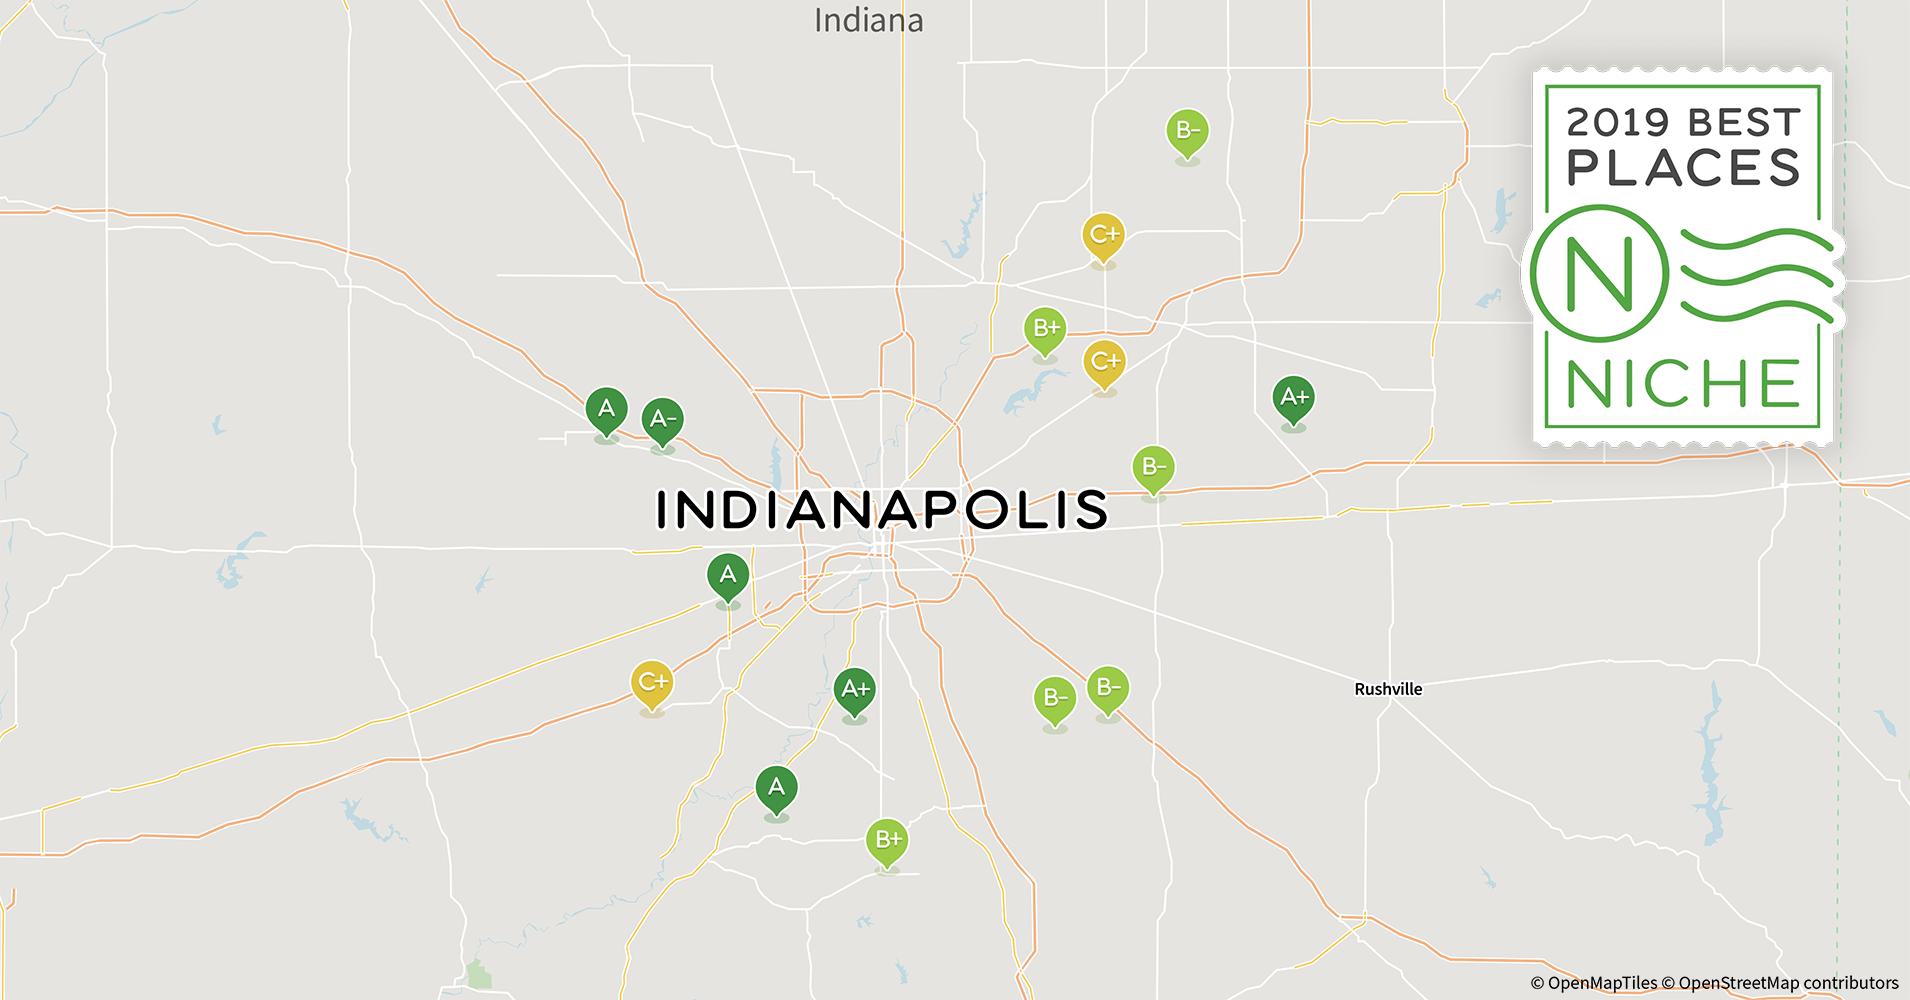 2019 Best Neighborhoods to Live in Indianapolis Area - Niche Indianapolis Neighborhood Map on